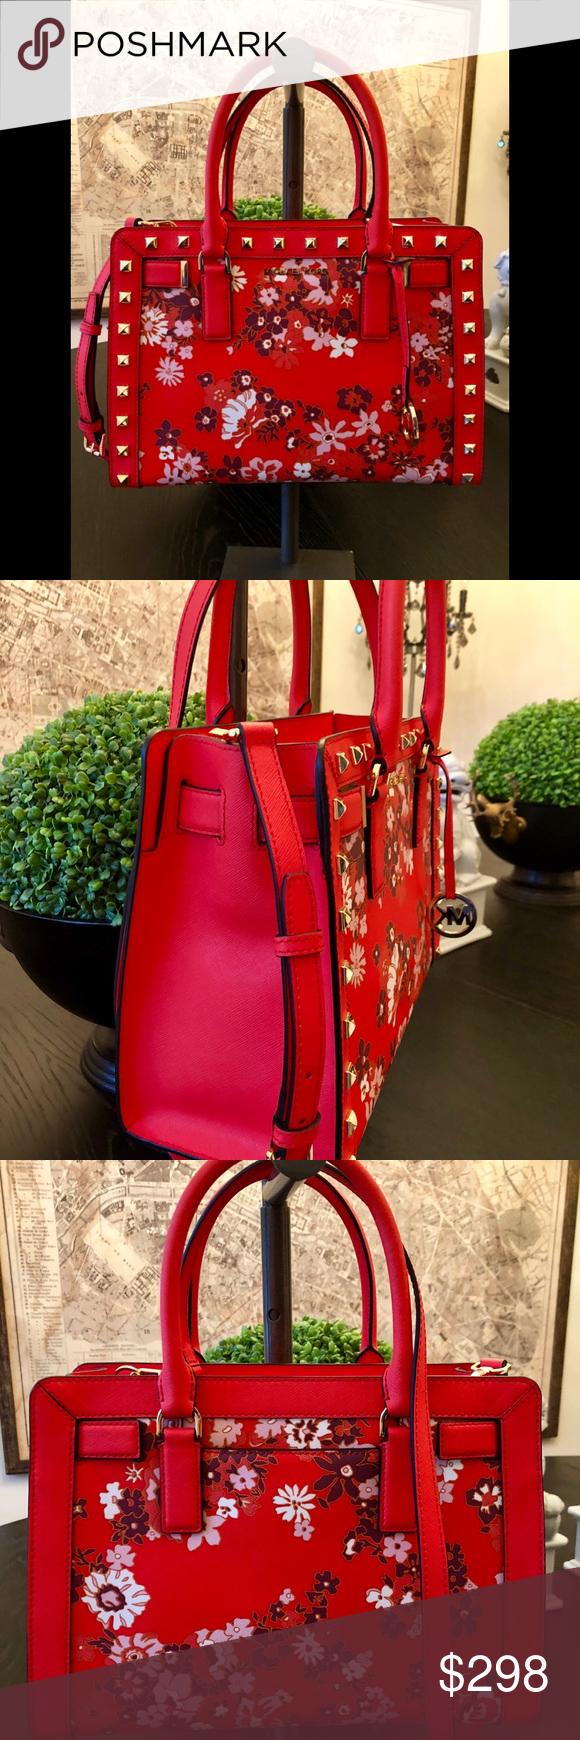 a4c16bbd8195 Spotted while shopping on Poshmark  Michael Kors Dillon Sangria Medium  Studded Satchel!  poshmark  fashion  shopping  style  Michael Kors  Handbags